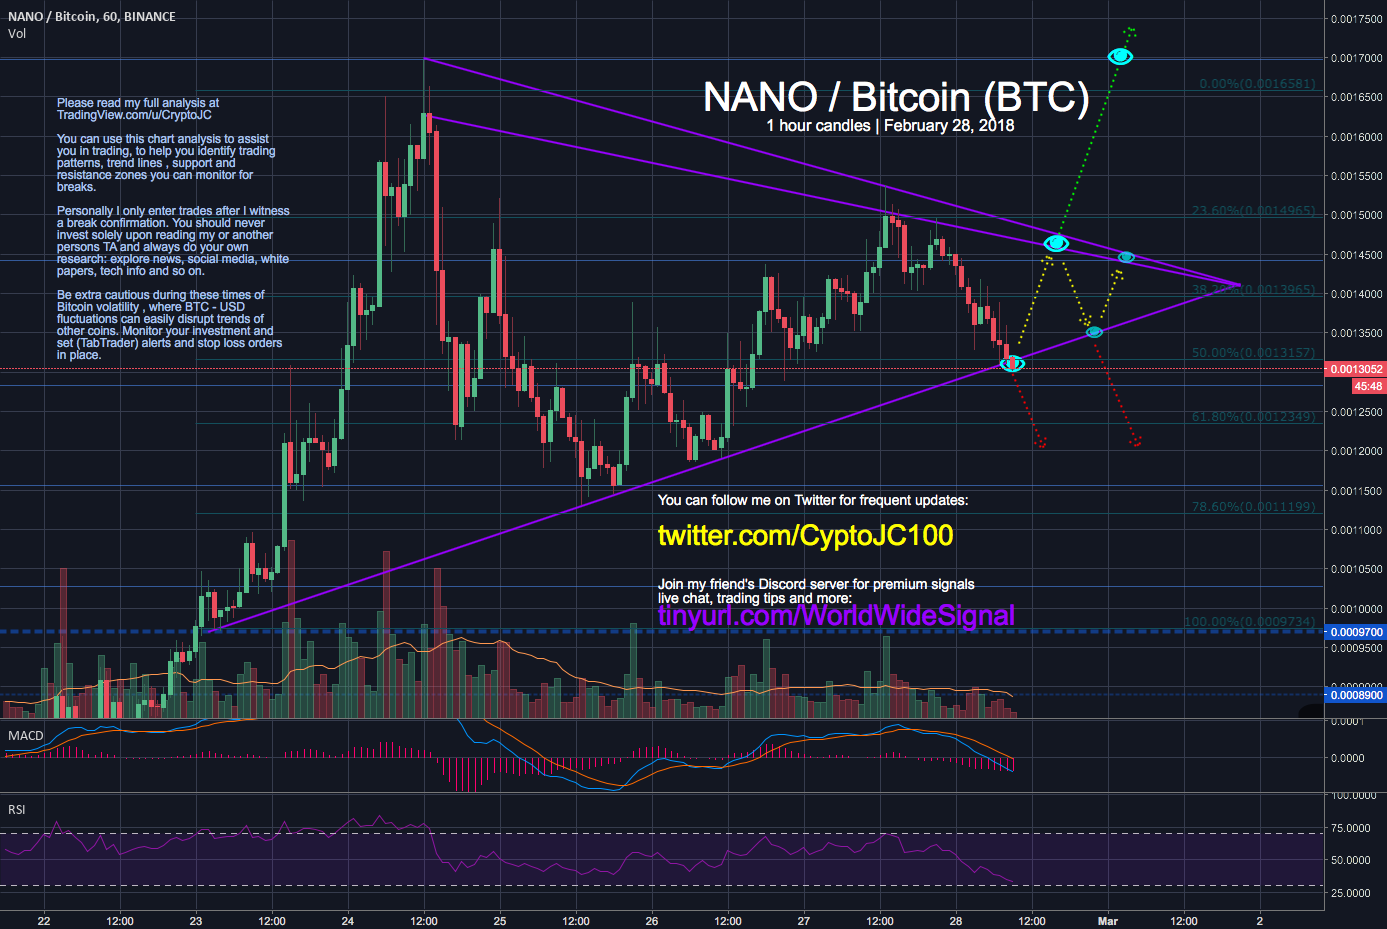 NANO Bitcoin BTC testing pennant bottom for bounce or break